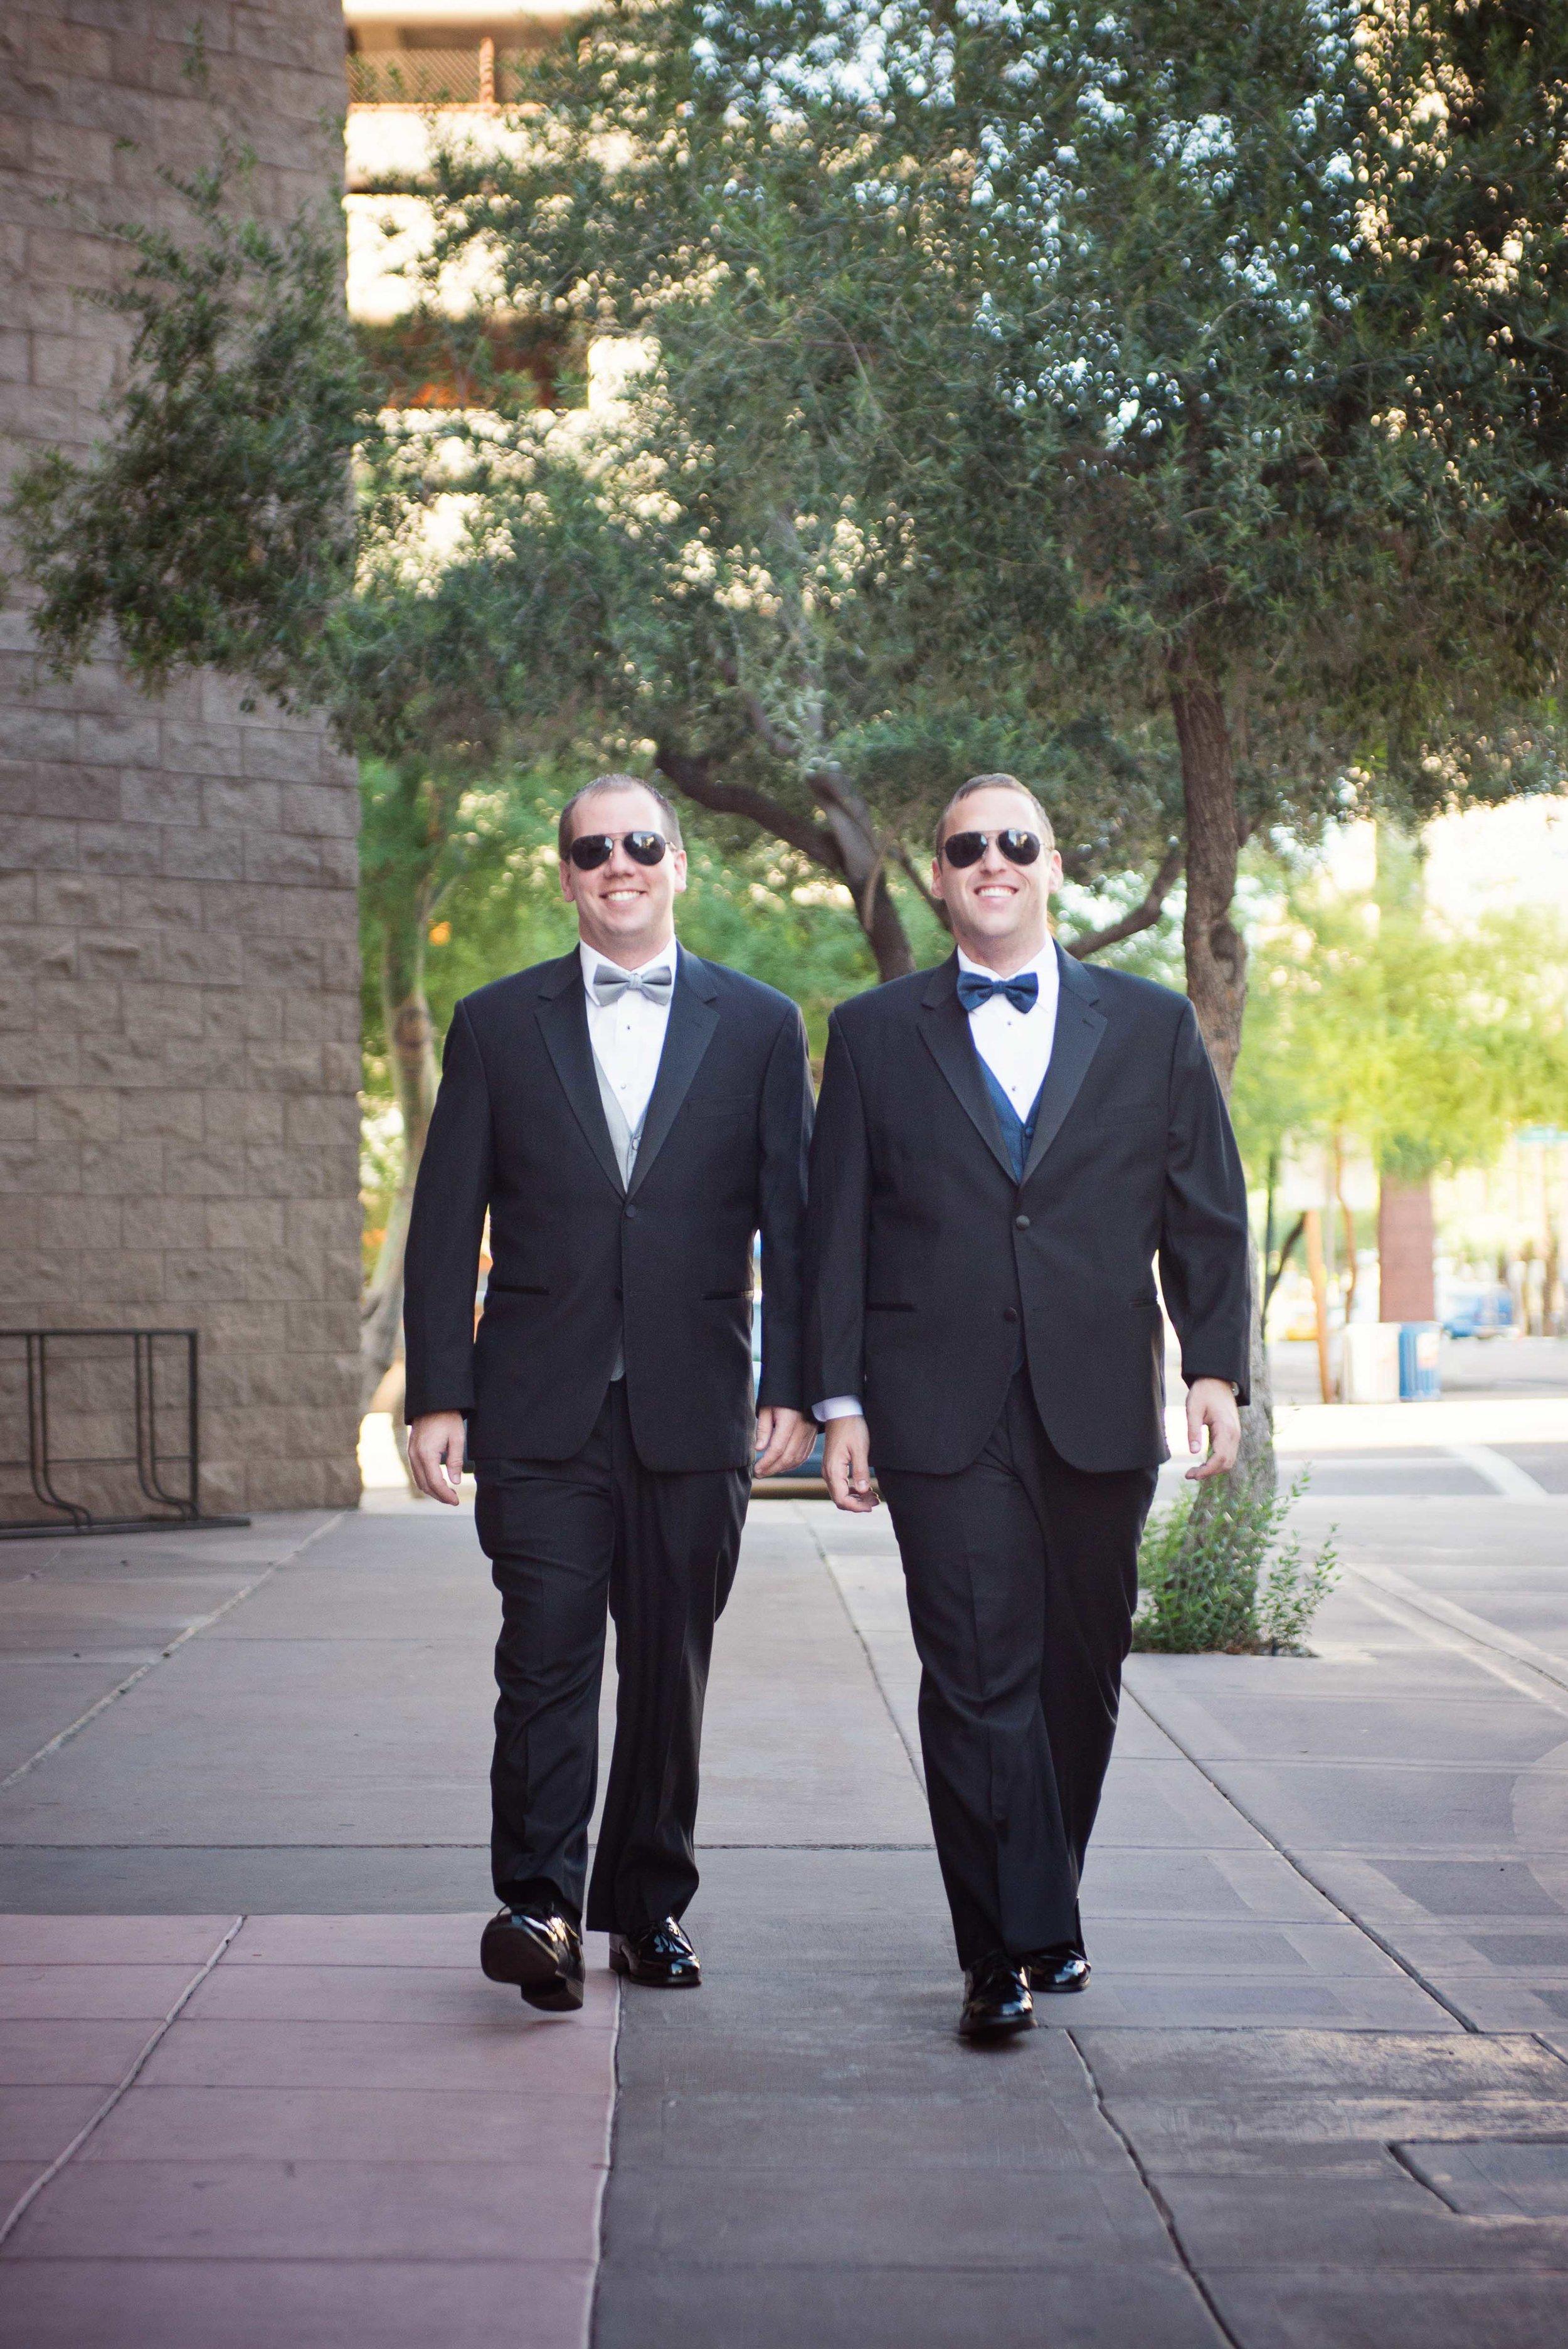 weddingwebsitesmallerpics-73.jpg